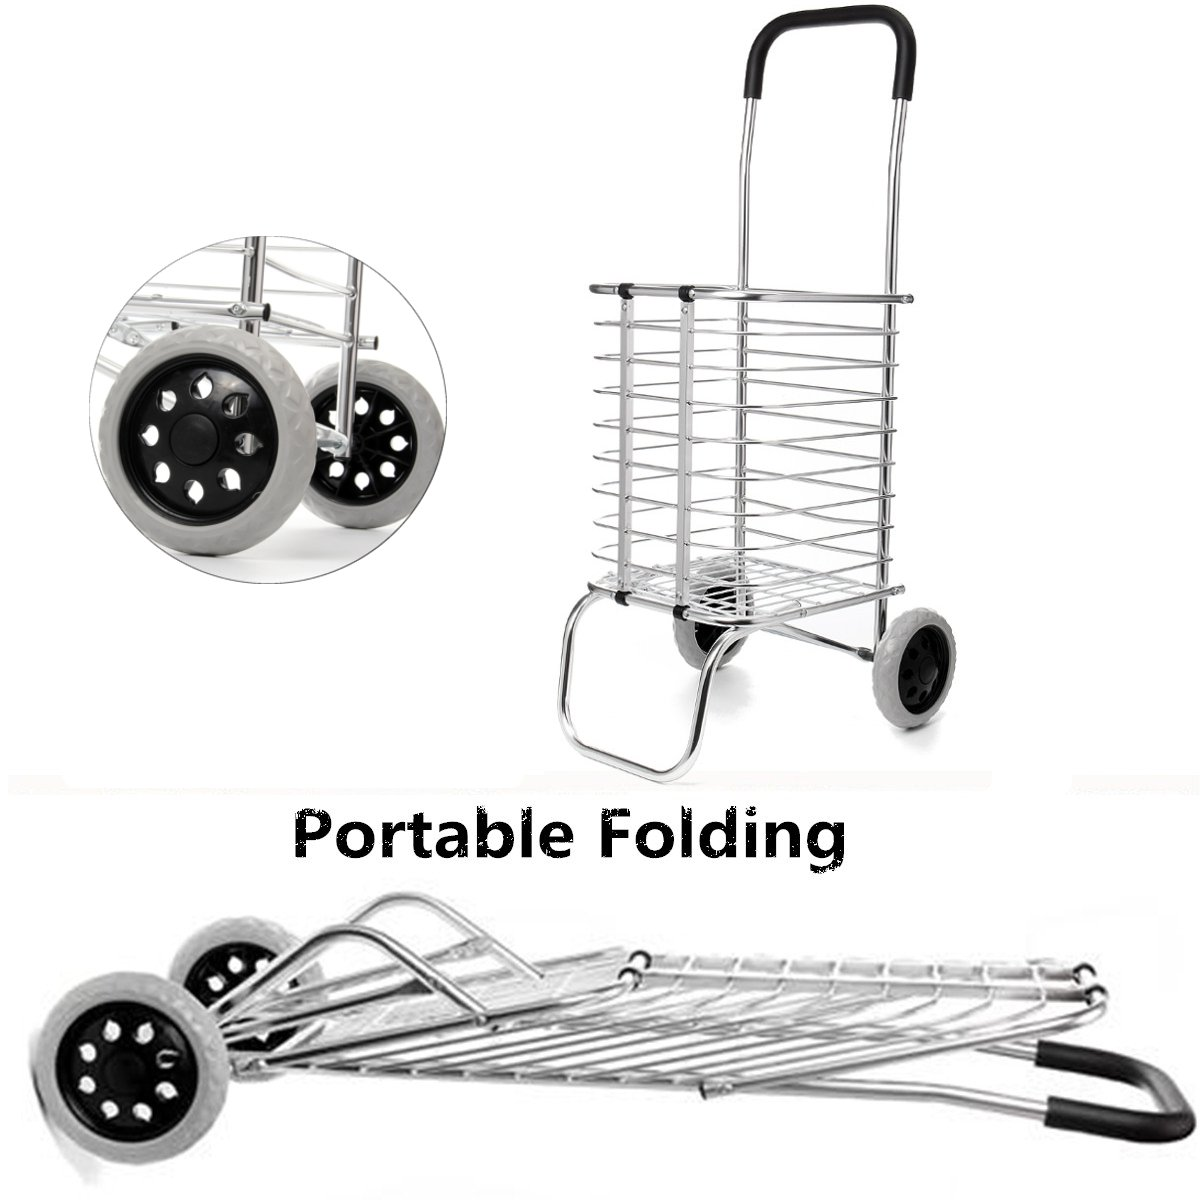 2 Wheel Aluminum Folding Portable Shopping Market Grocery Basket Cart Trolley Quality Aluminum Frame Bold